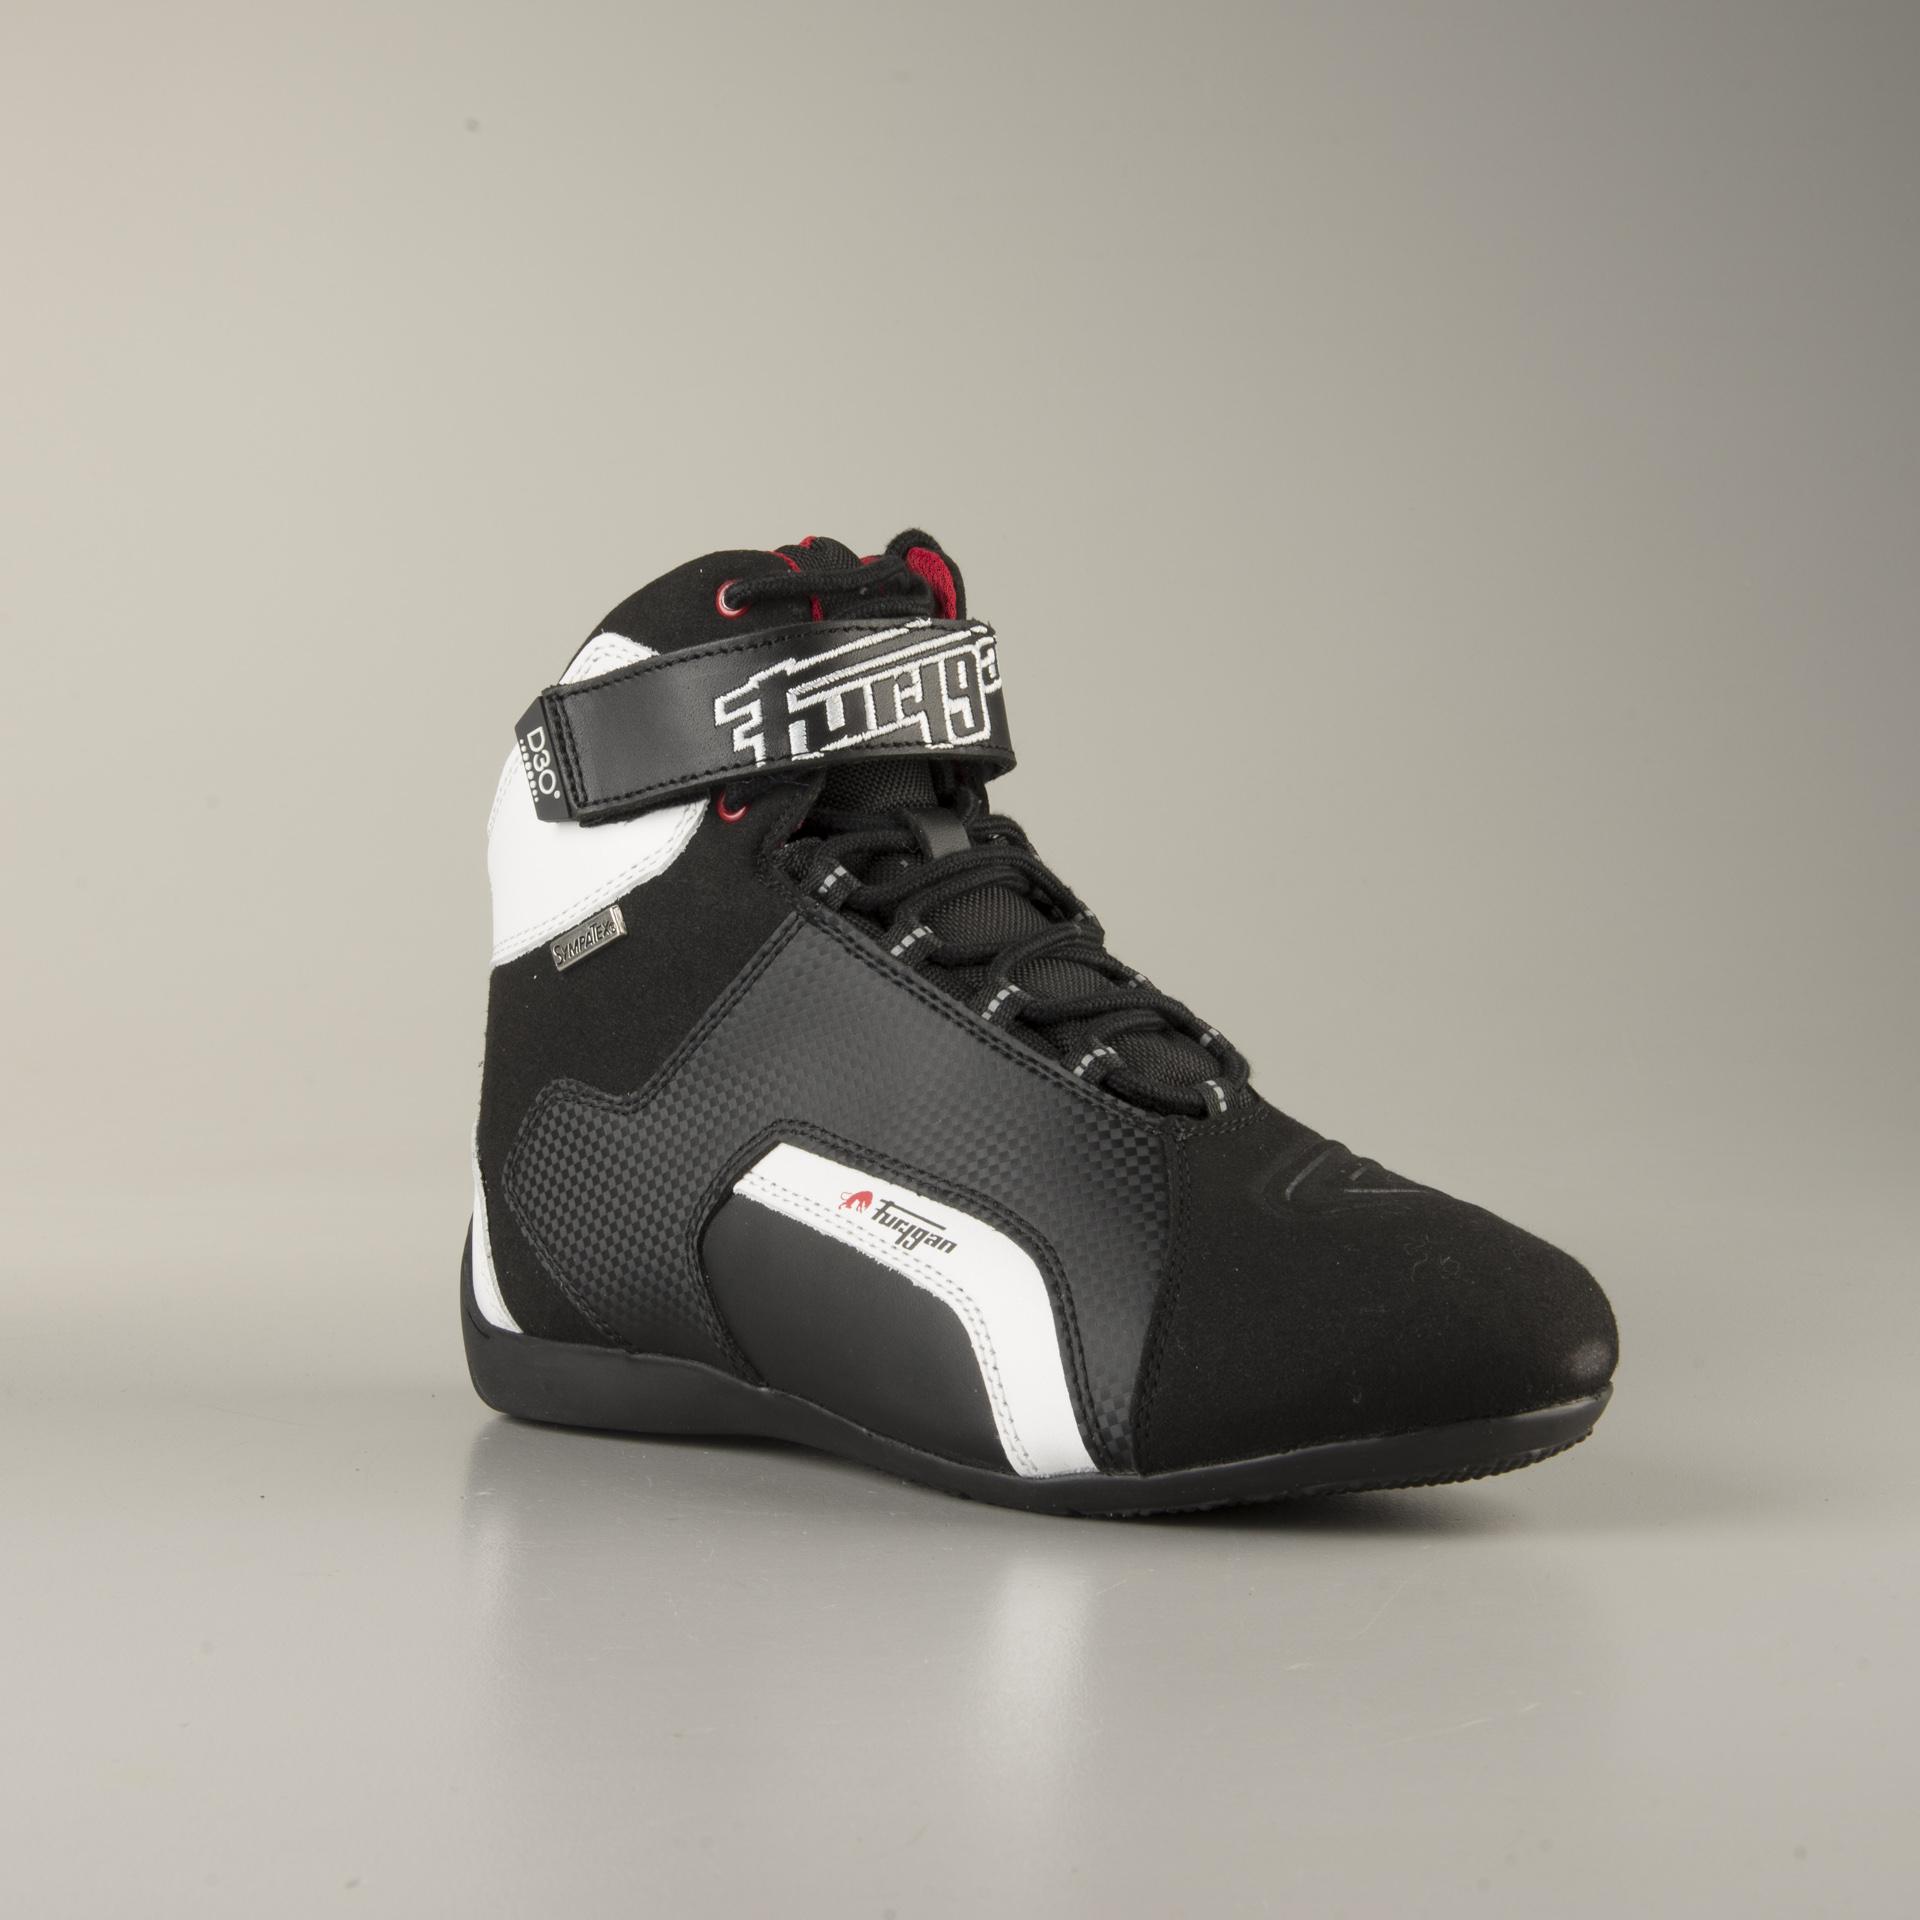 Chaussures Furygan Jet D3O Sympatex Noir Blanc